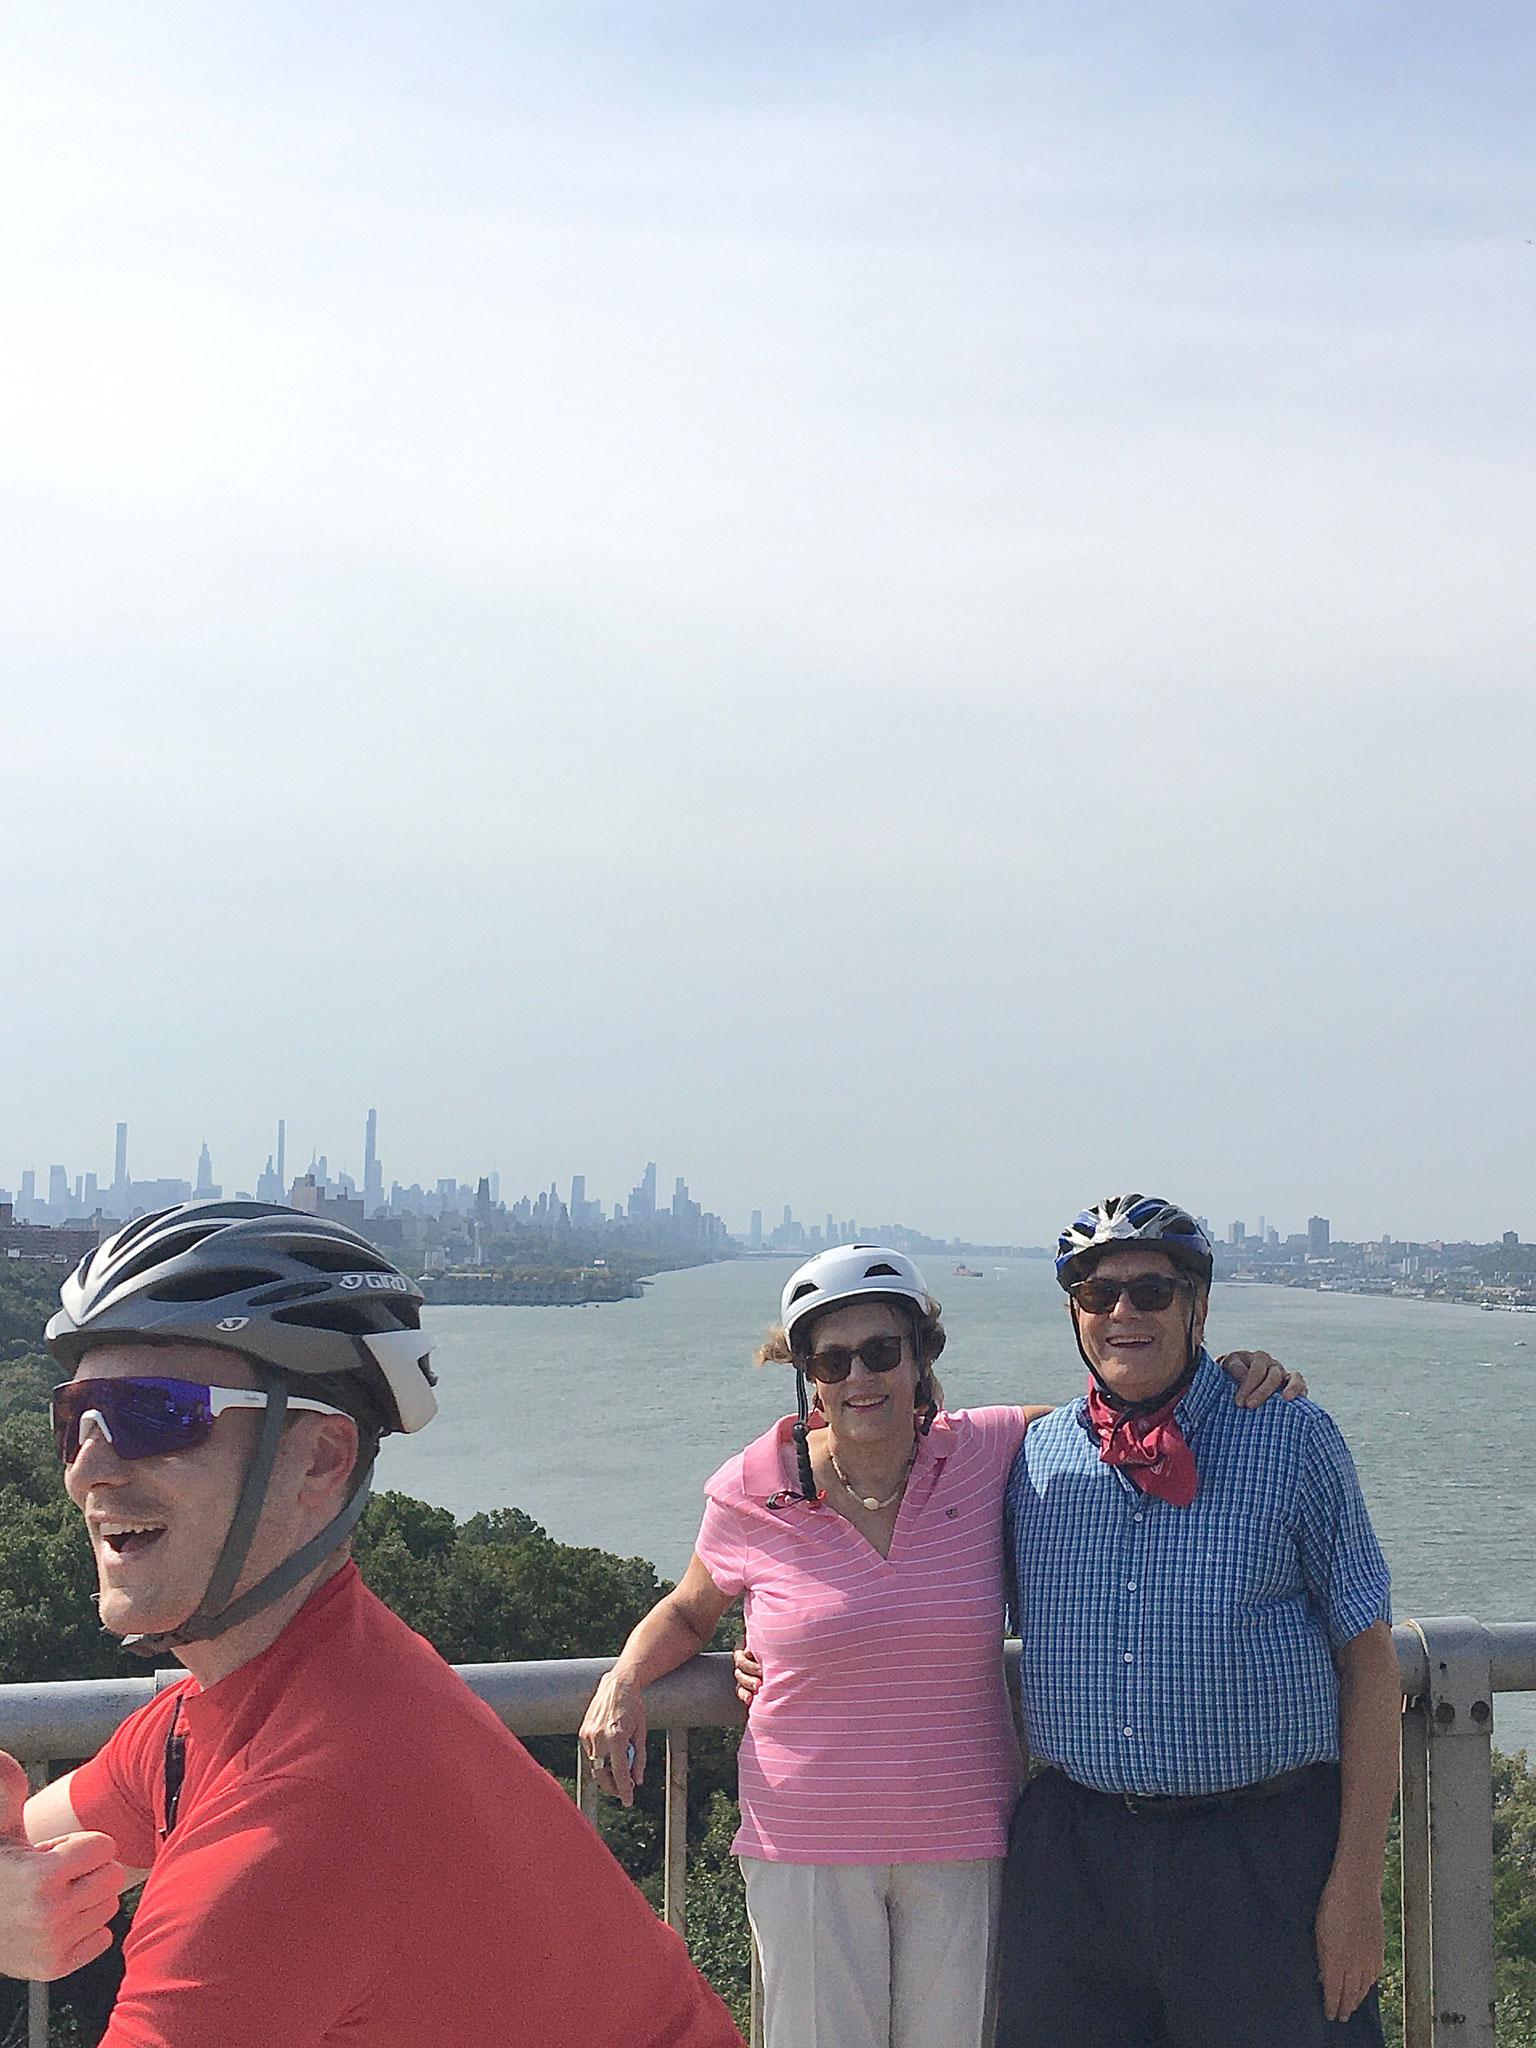 Photobombed by a happy biker, biking on the GW Bridge, 10-10-20